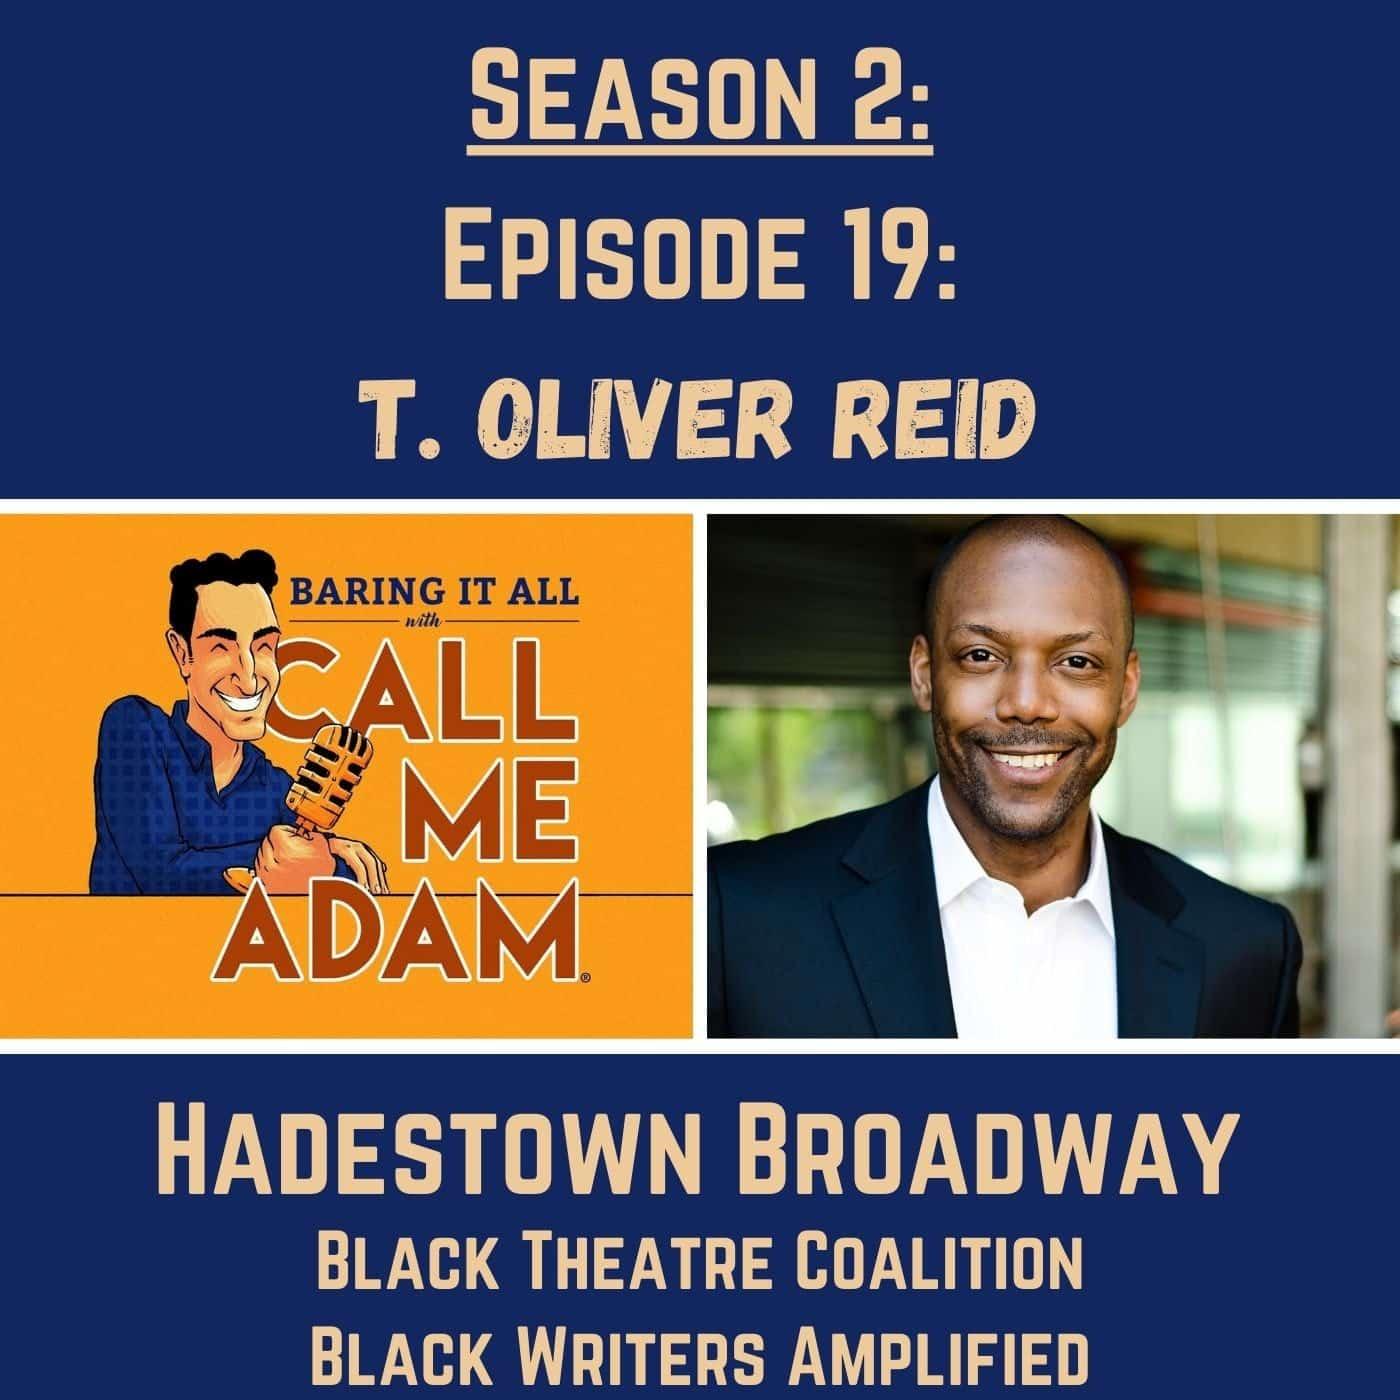 Season 2: Episode 19: T. Oliver Reid: Hadestown, Broadway, Black Theatre Coalition, Black Voices Amplified, Actor, Broadway Re-Opening